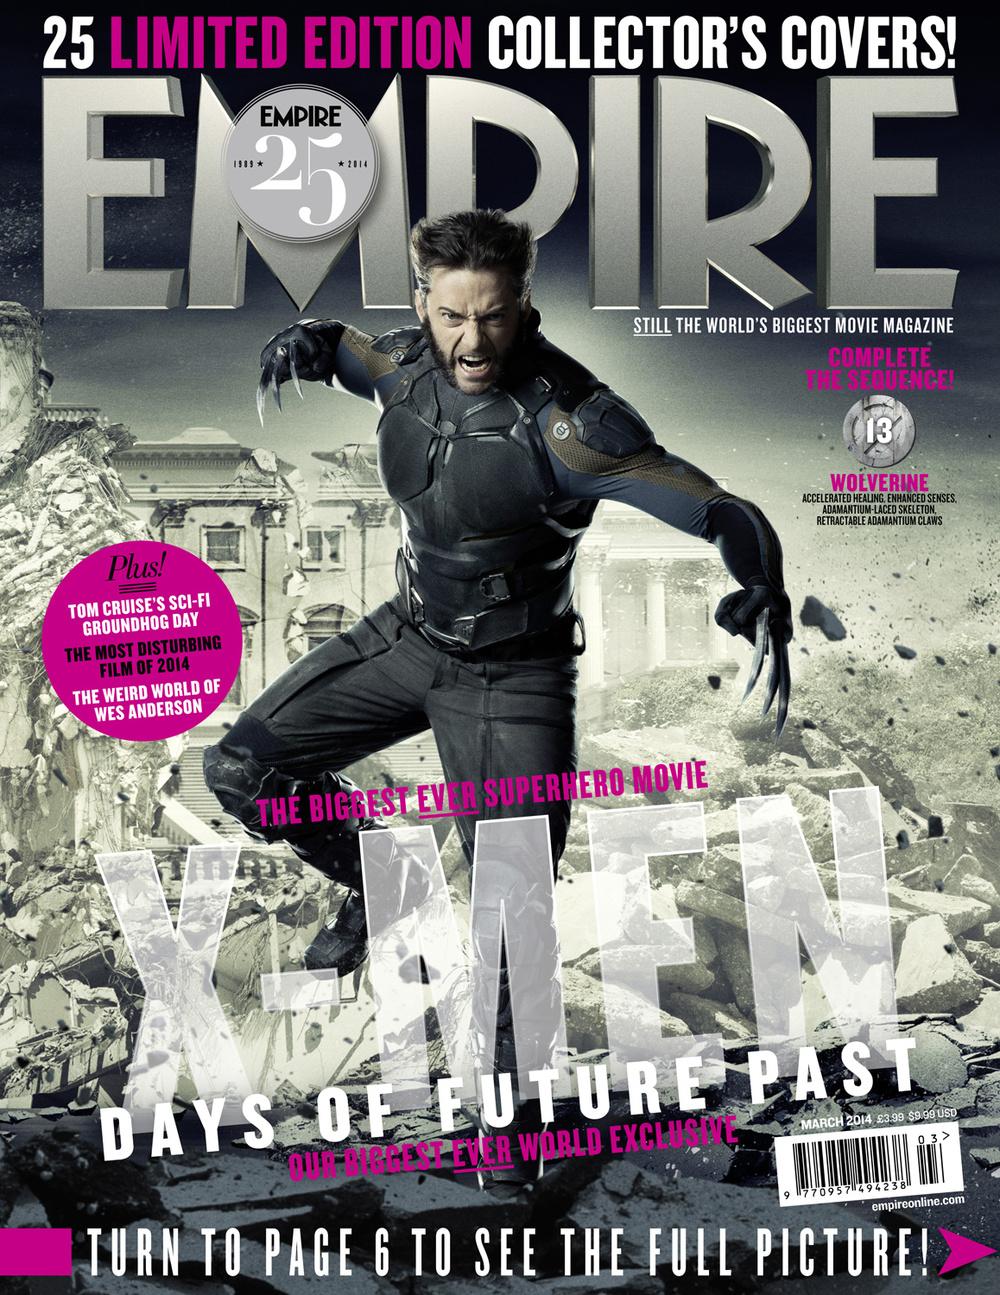 empire-xdofp-13.jpg.crop_display.jpg